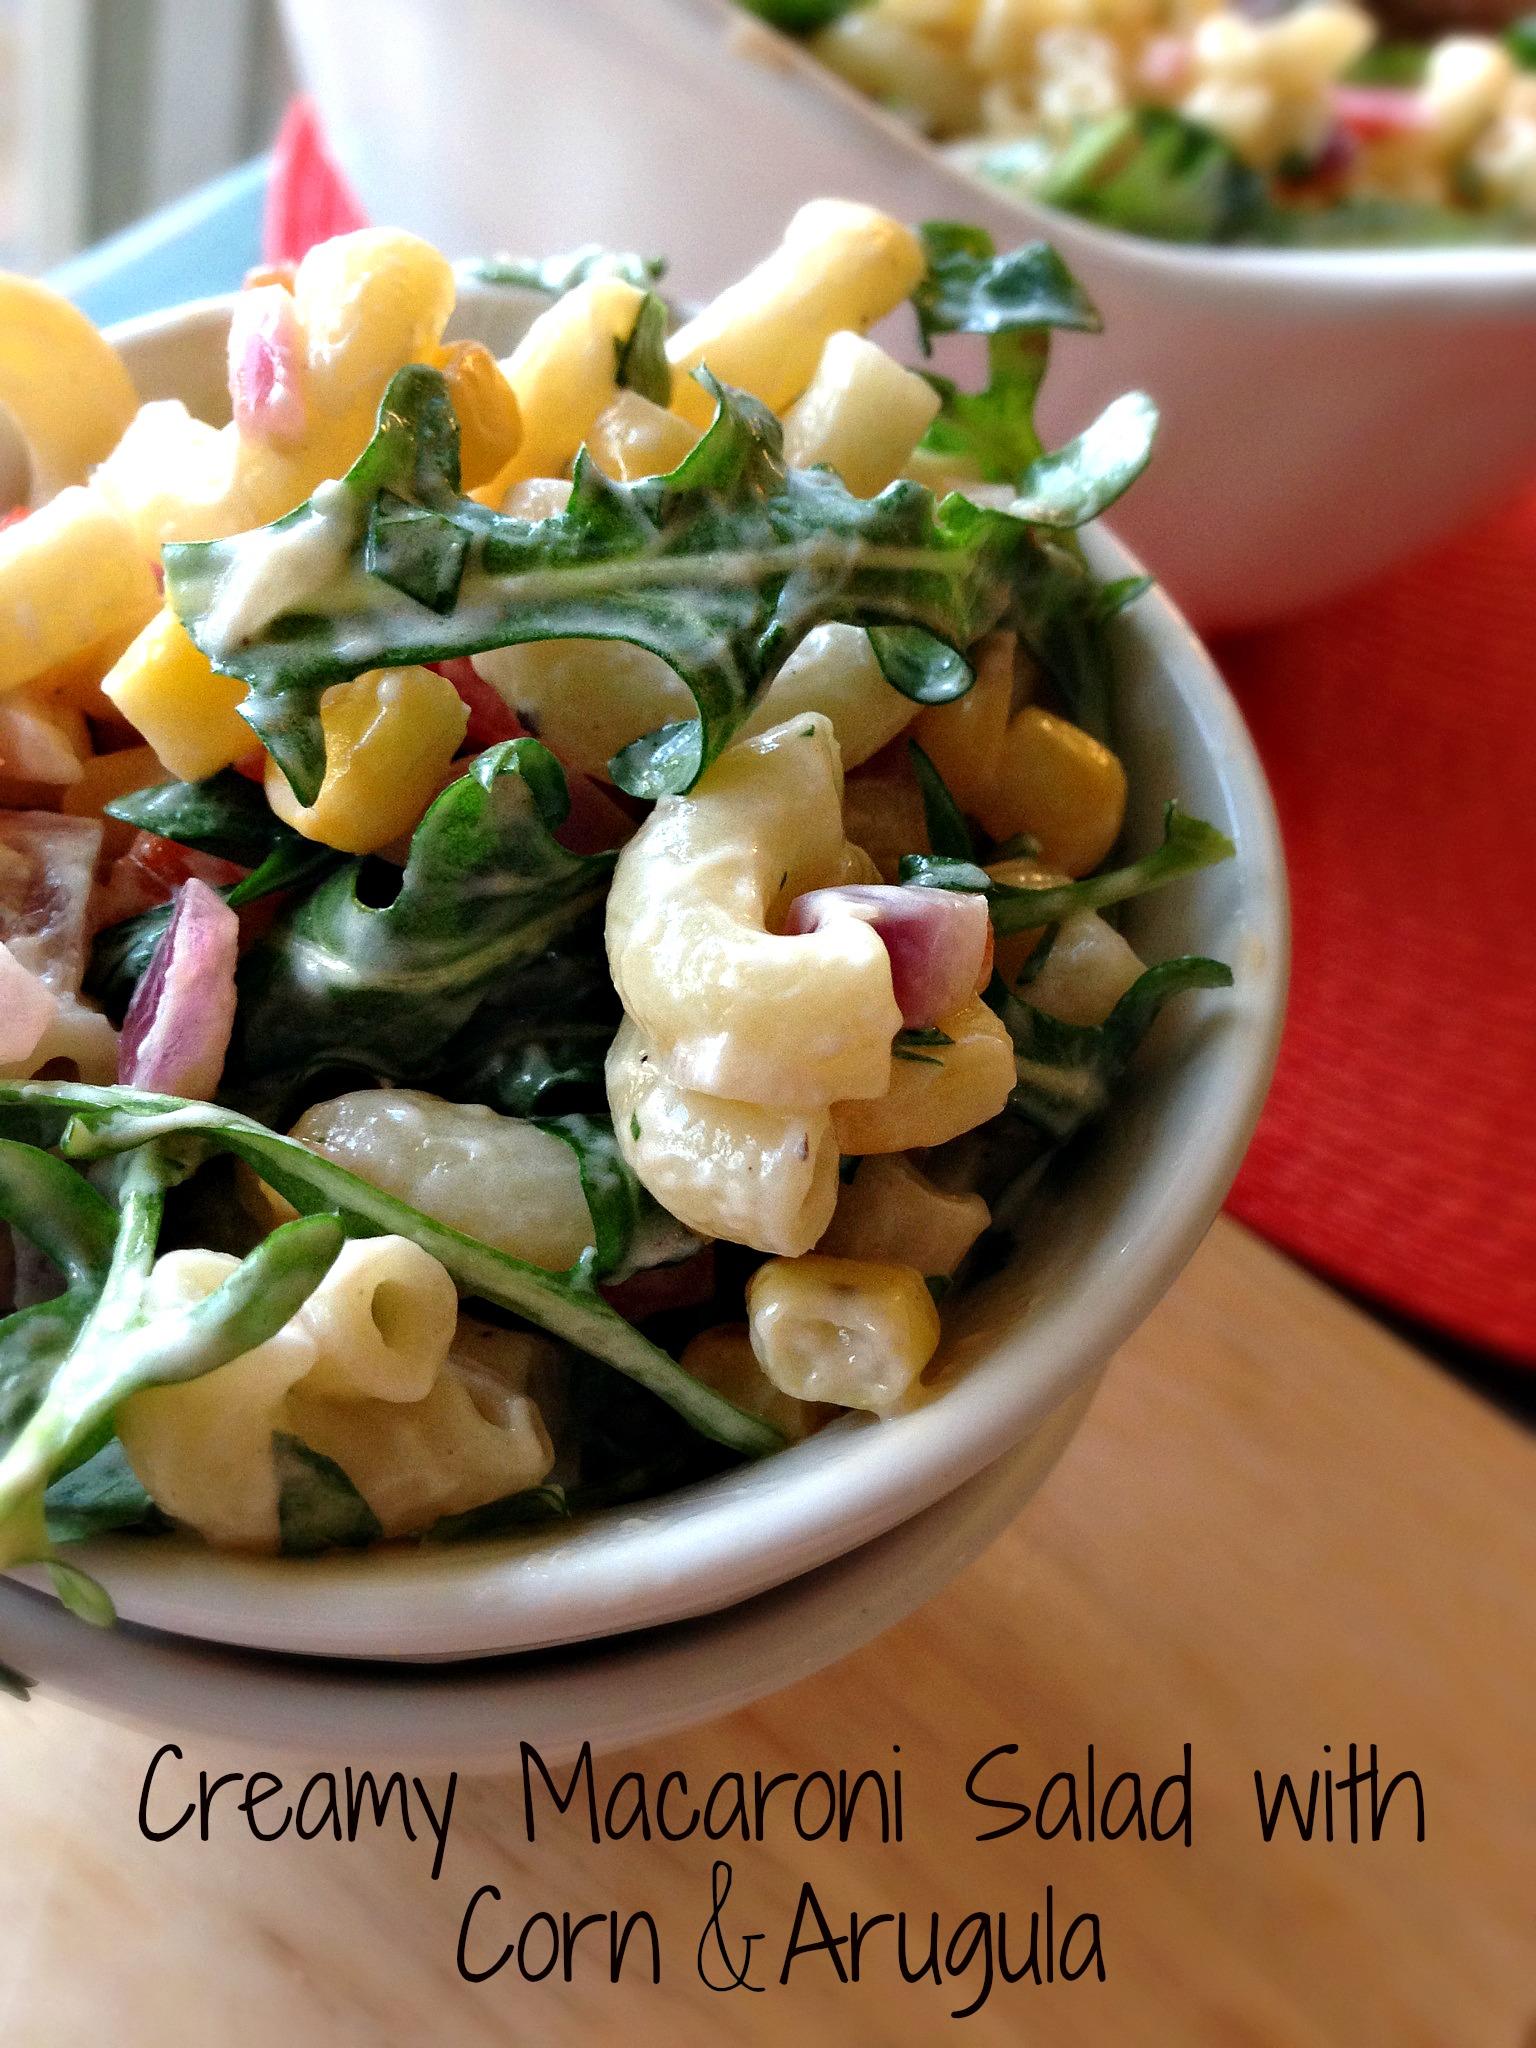 Creamy Macaroni Salad with Corn & Arugula